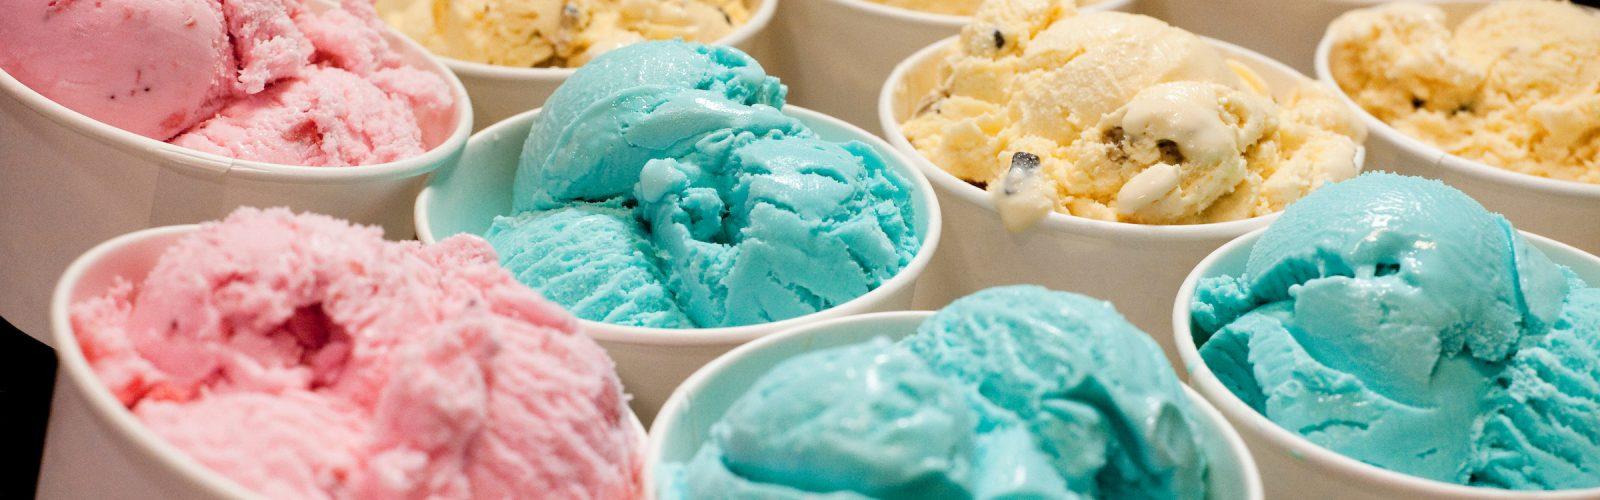 Babcock ice cream